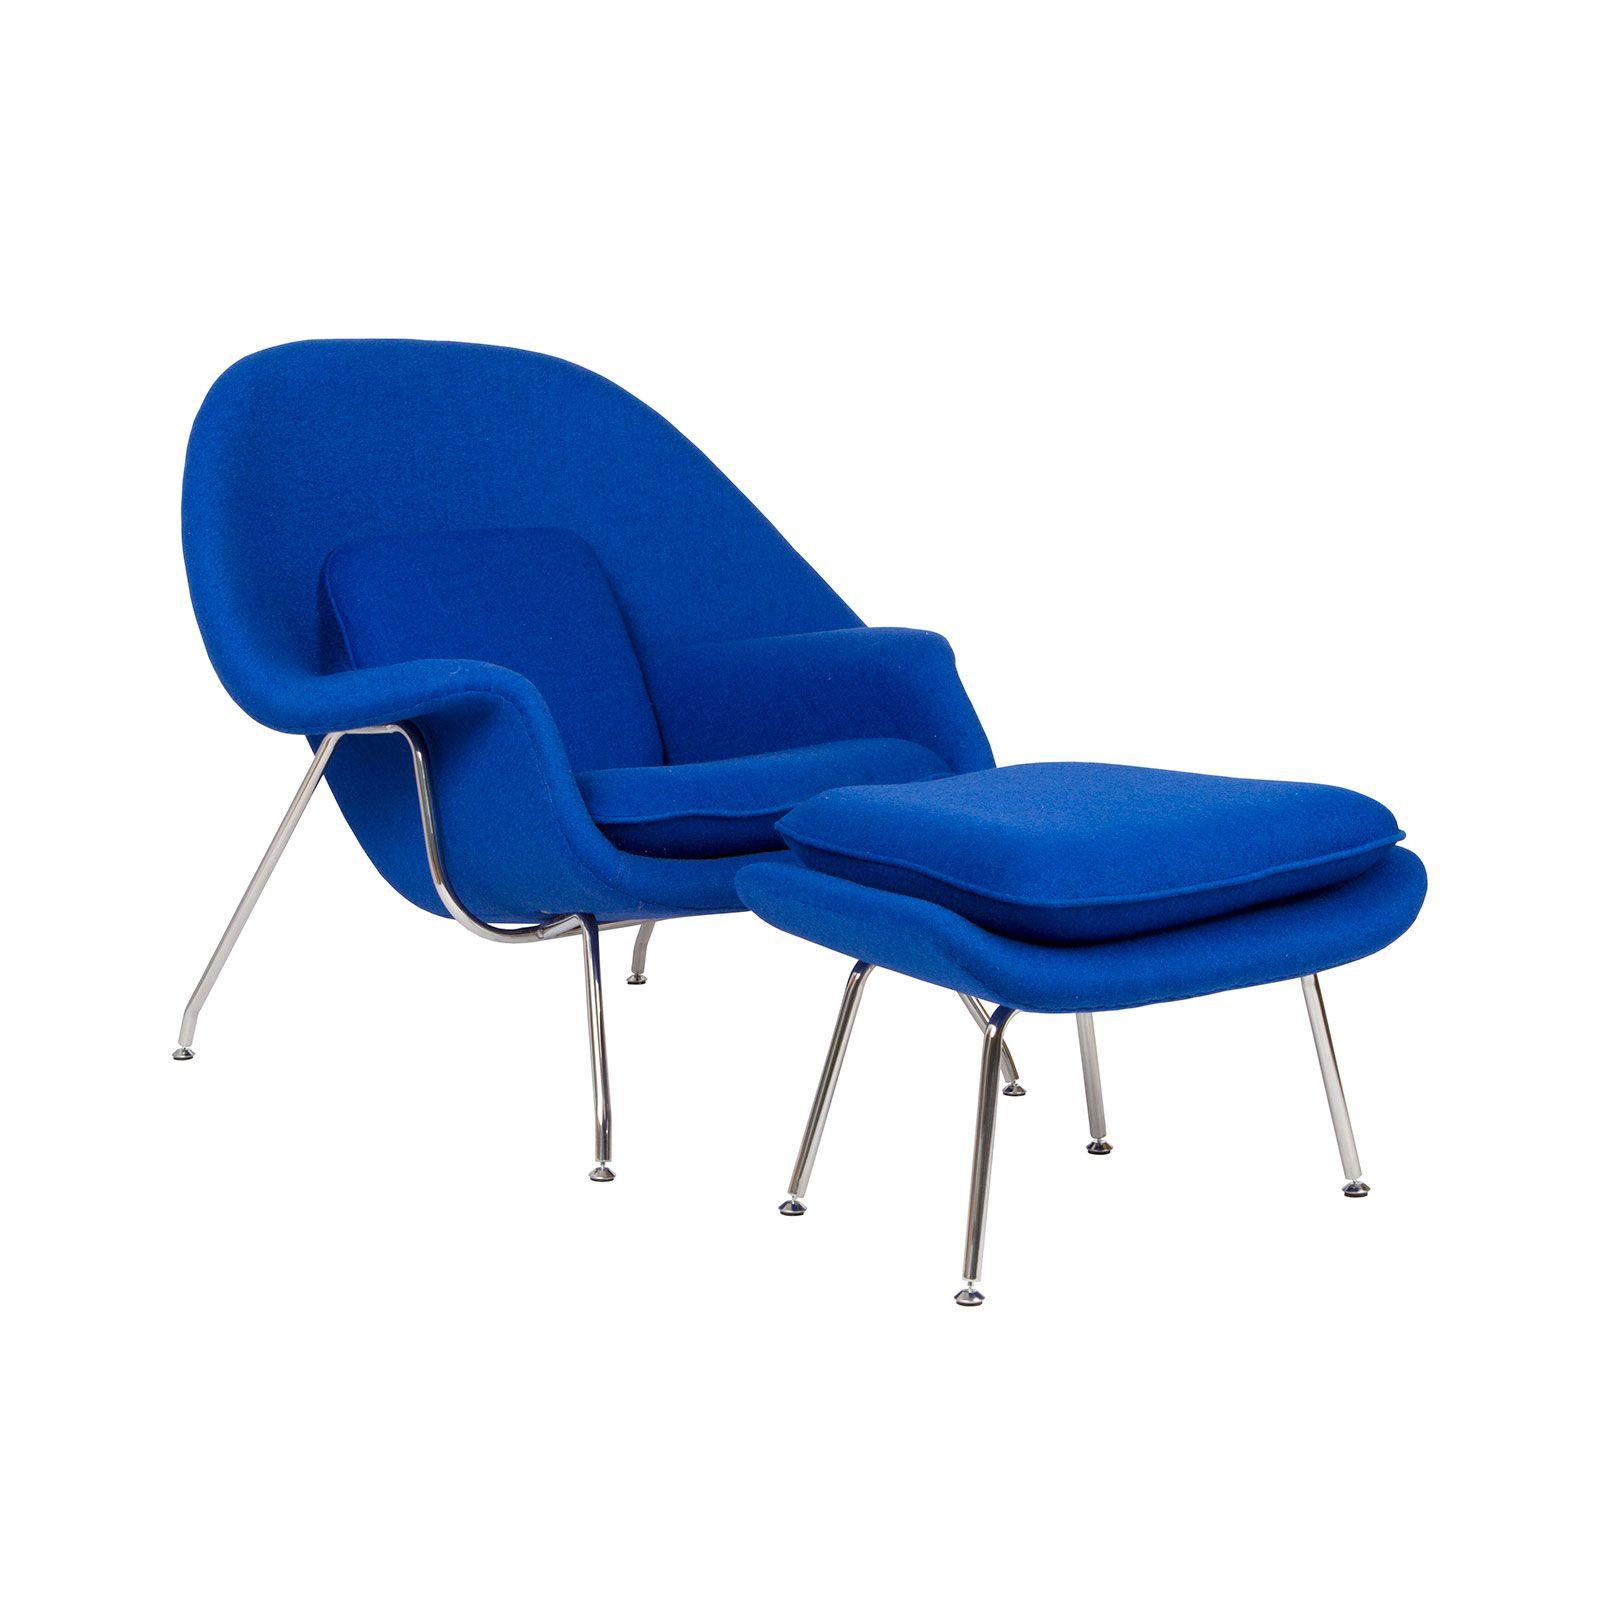 Nest Lounge & Ottoman Set in Blue | dotandbo.com | Mid ...